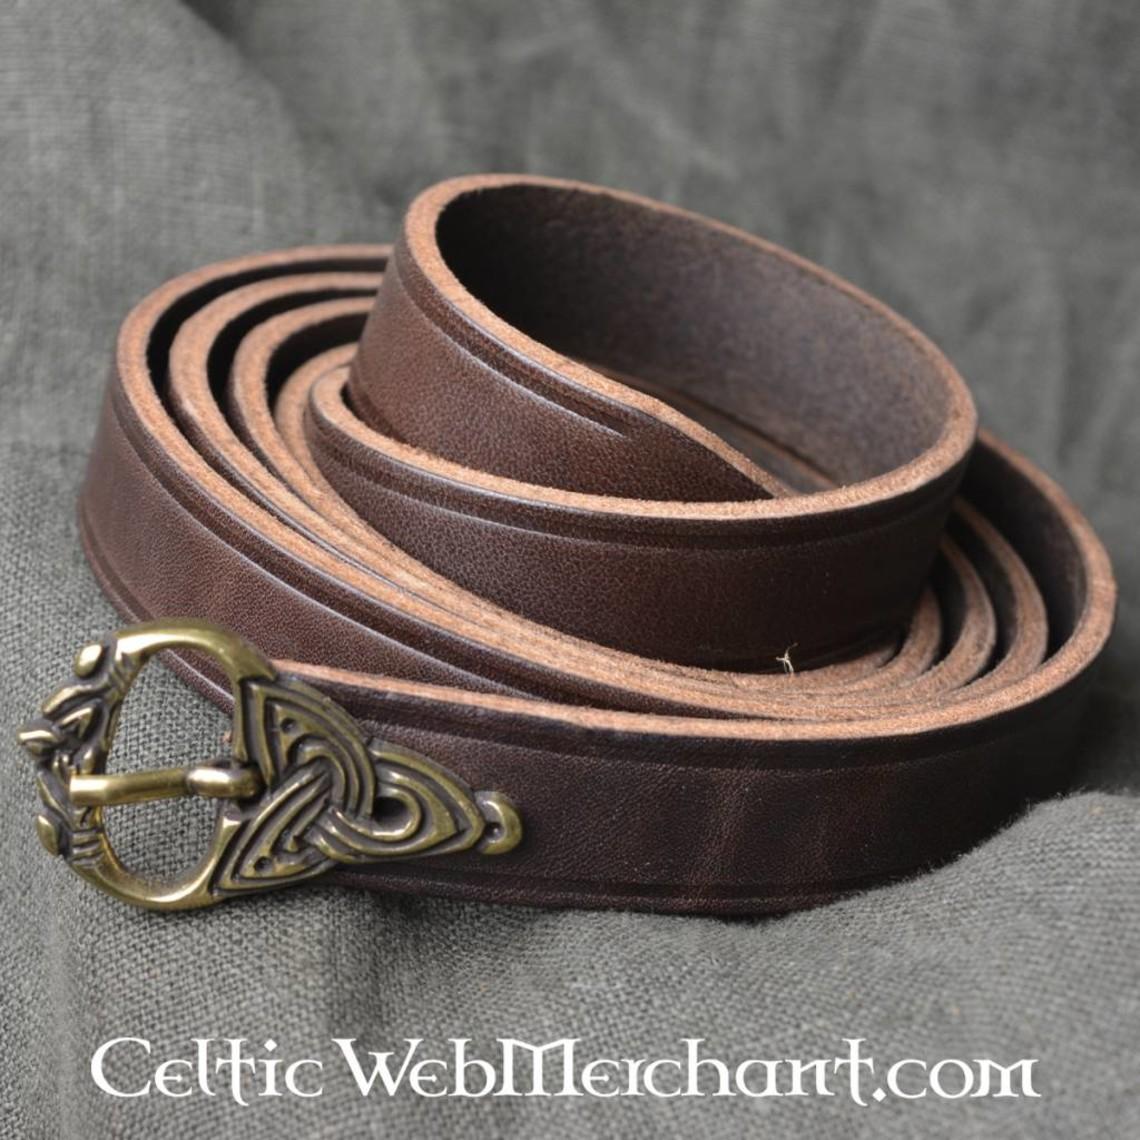 9th century Viking belt